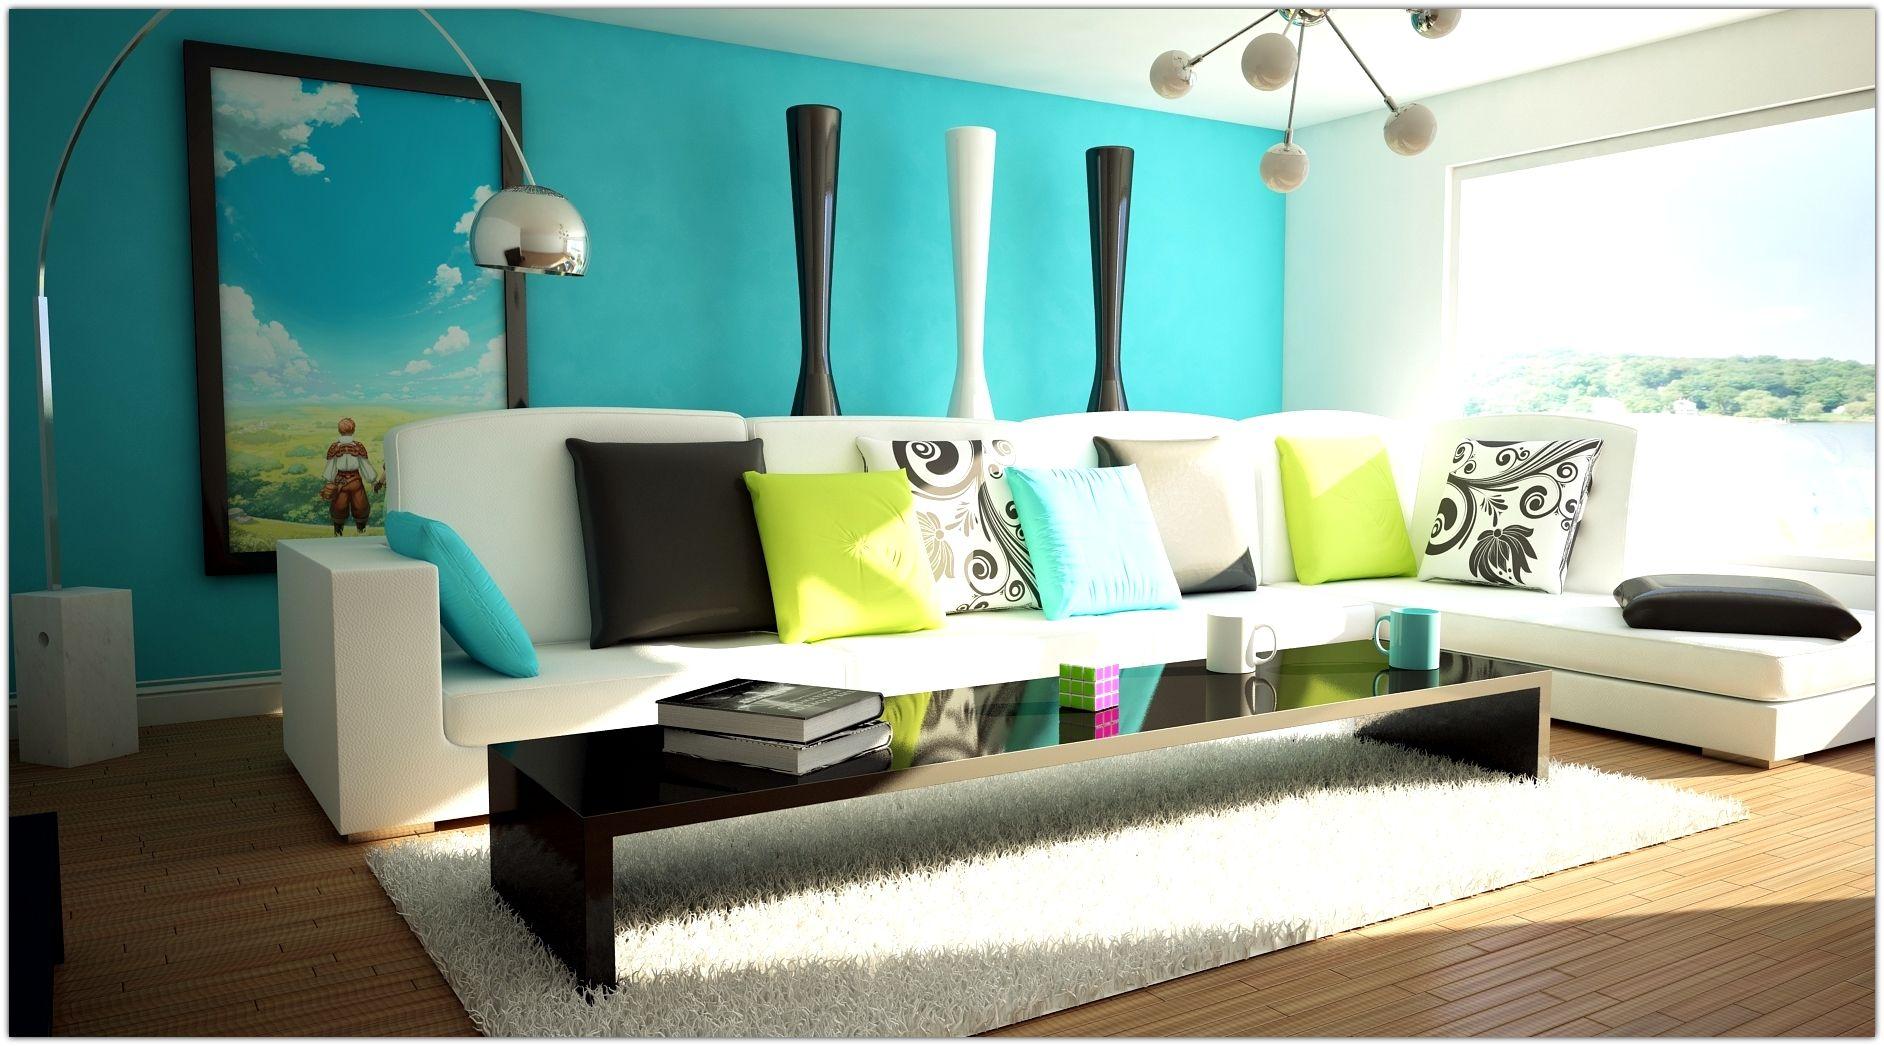 Merveilleux Interior Interior Design Firms Houston Tx Becoming An Interior  Designer And Yolanda Foster Interior Design How Can I Become An Interior Designer Look Some   ...